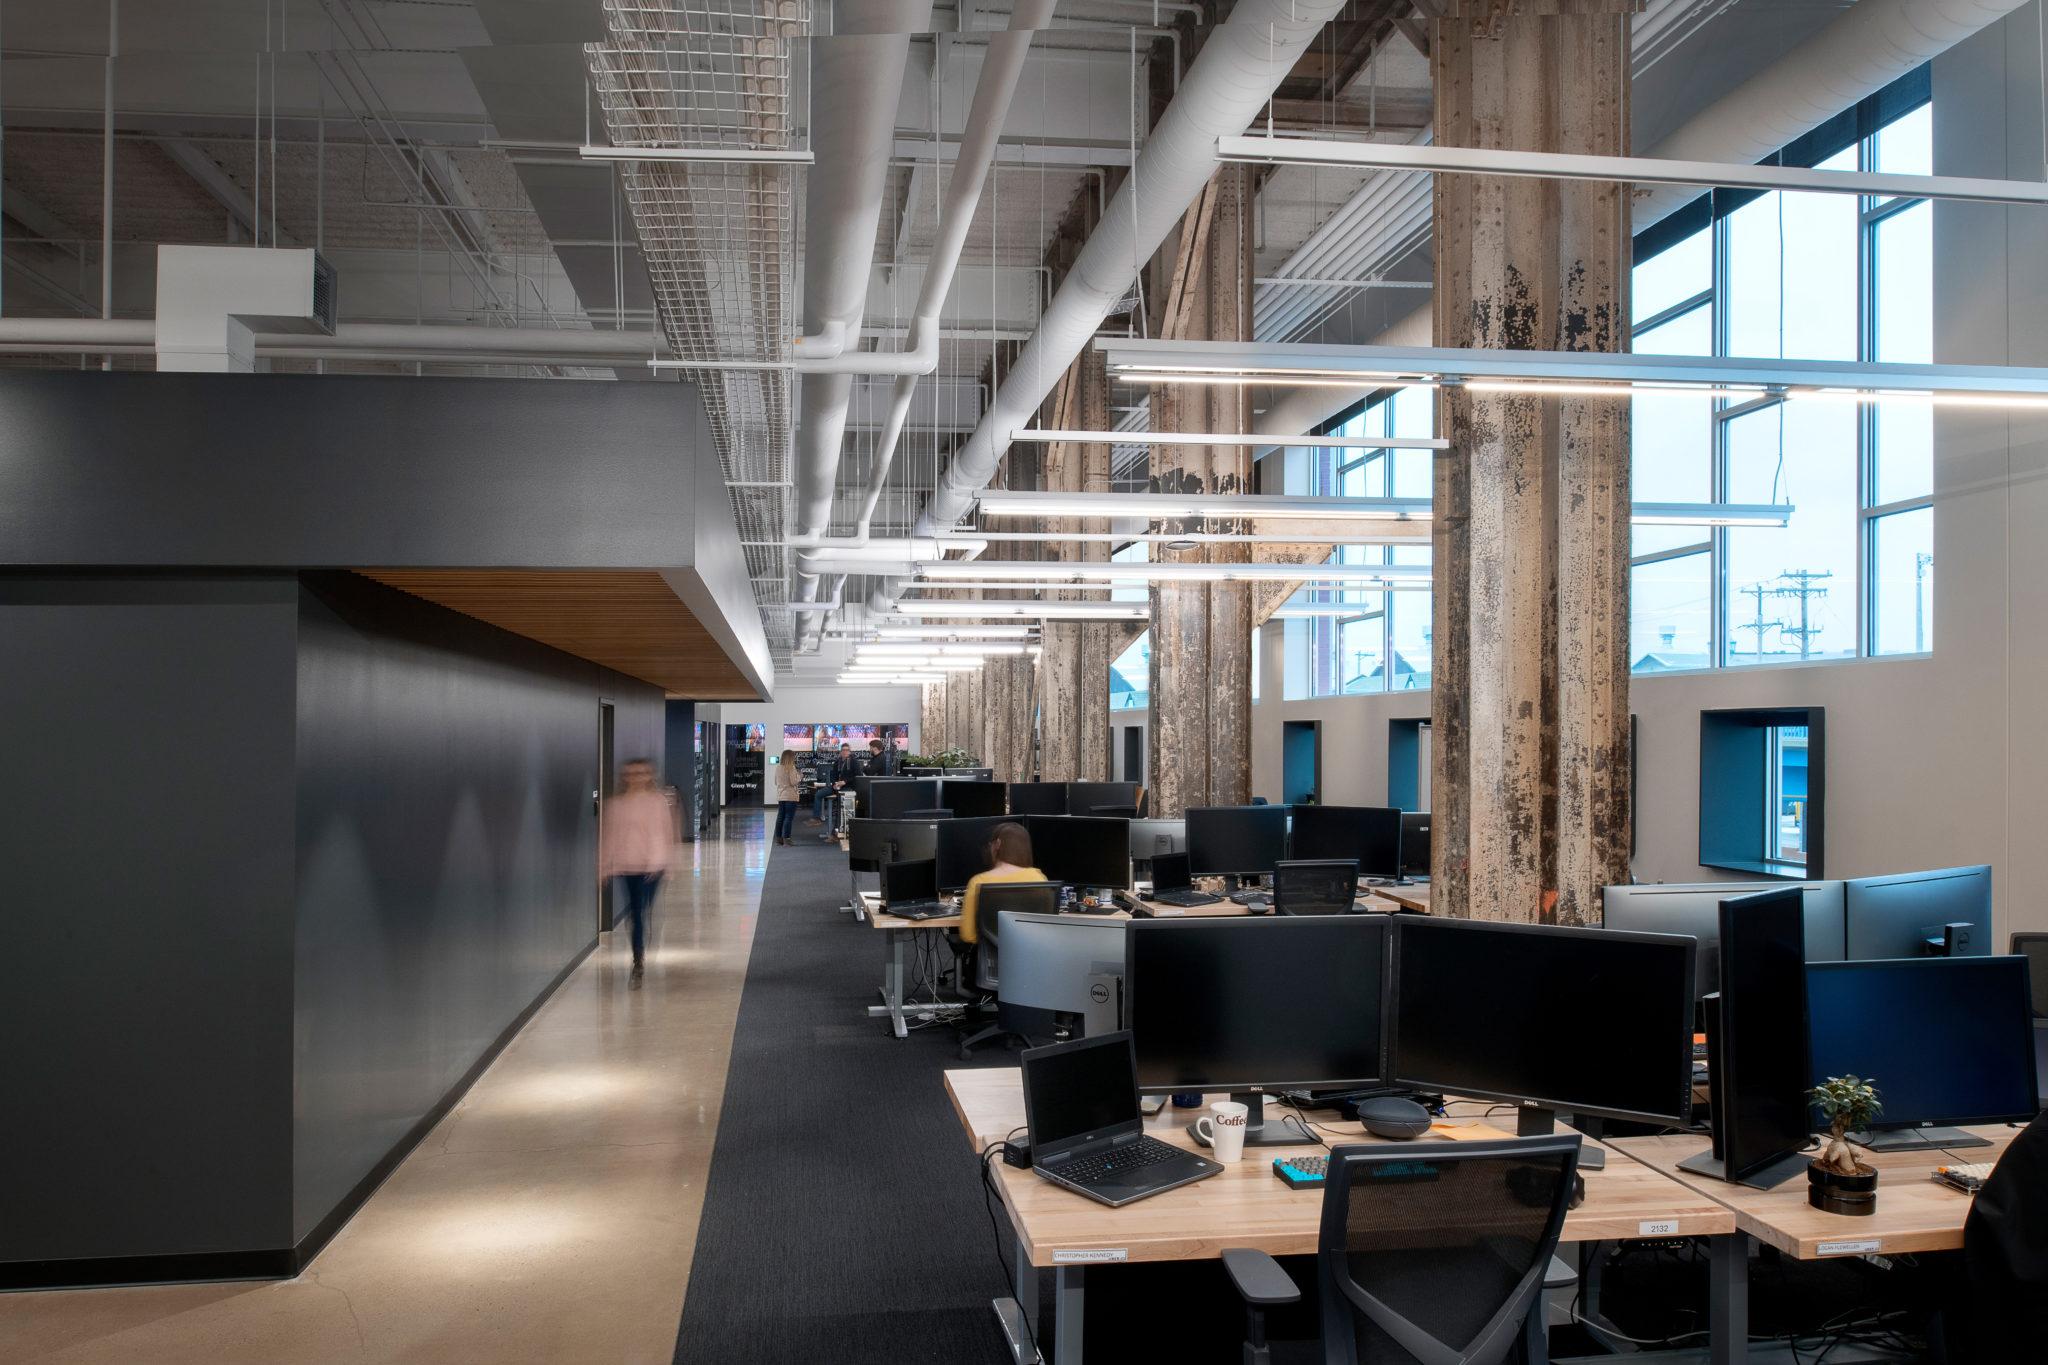 UBER Advanced Technology Group